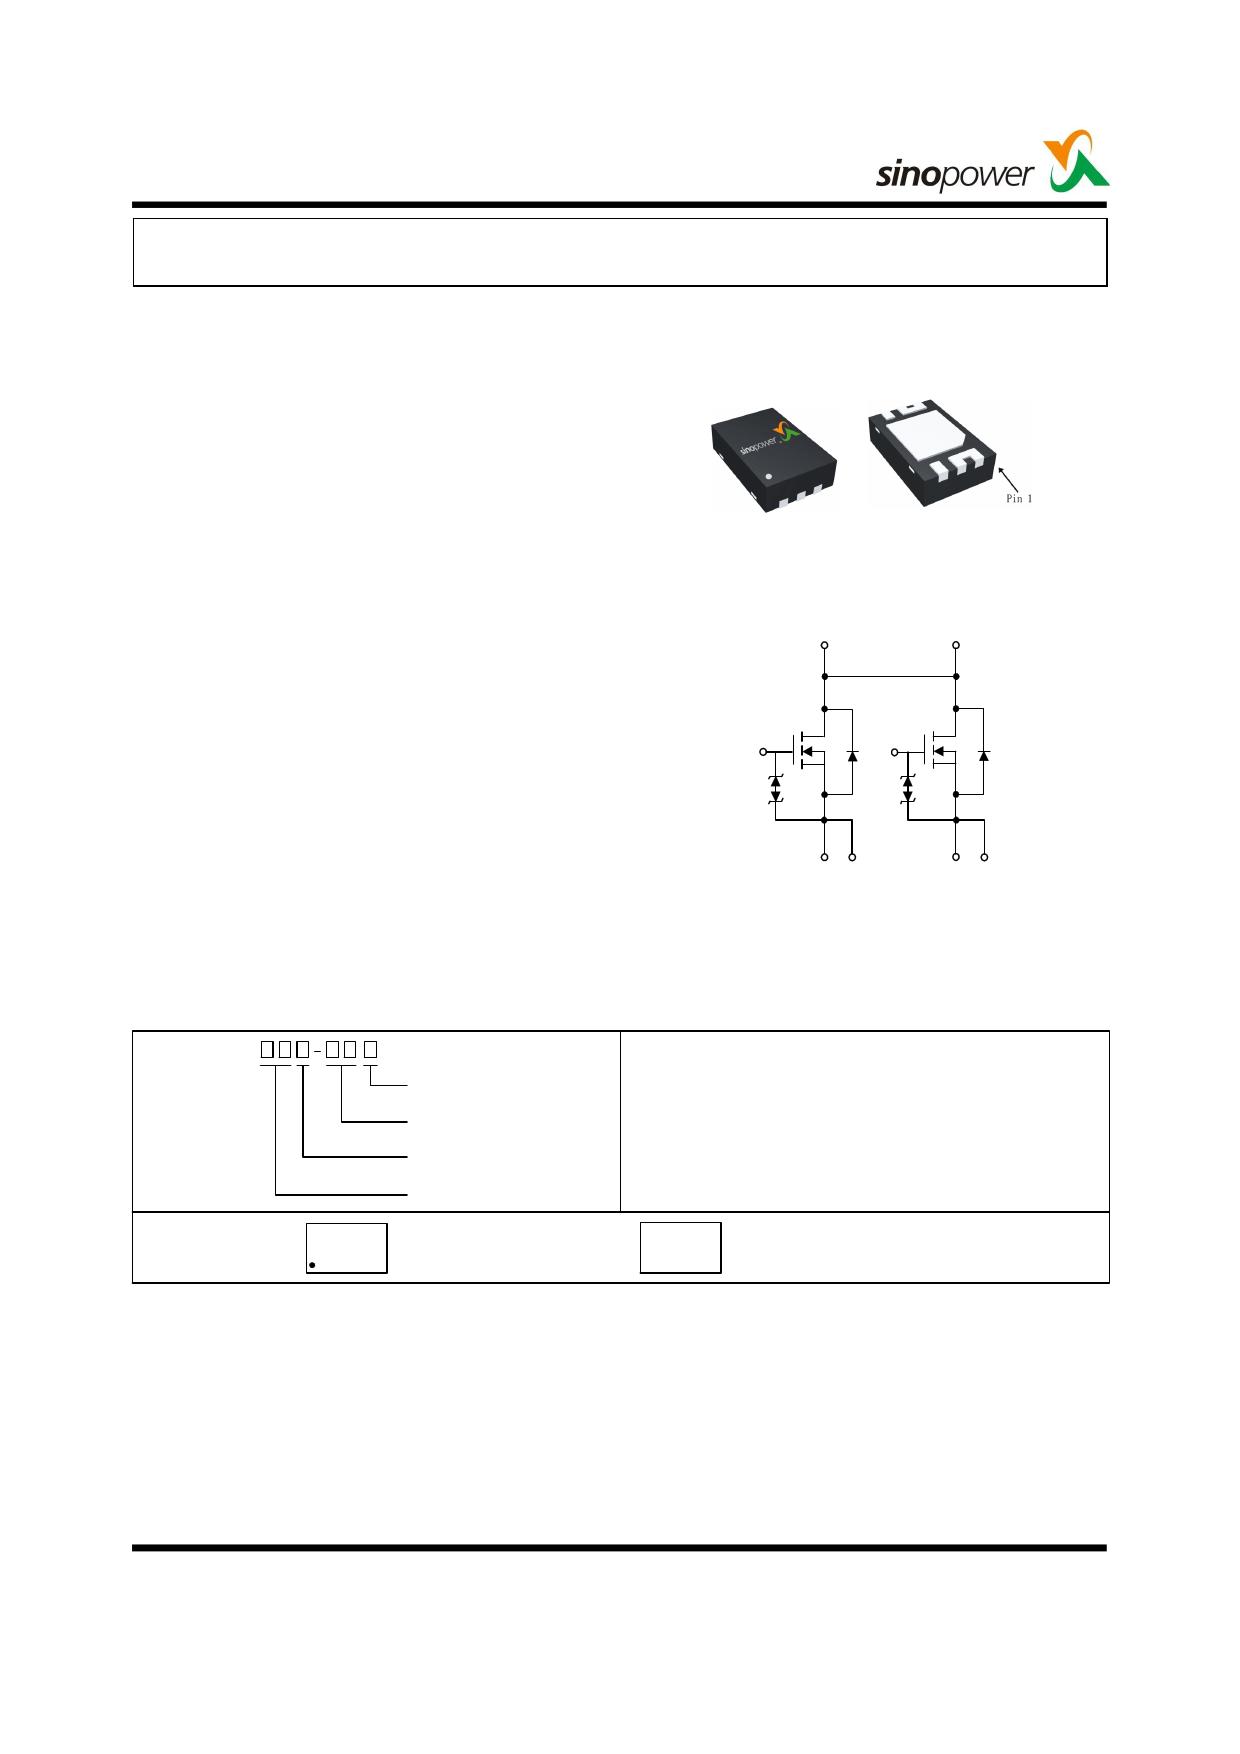 SM9993DSQG datasheet pinout pdf